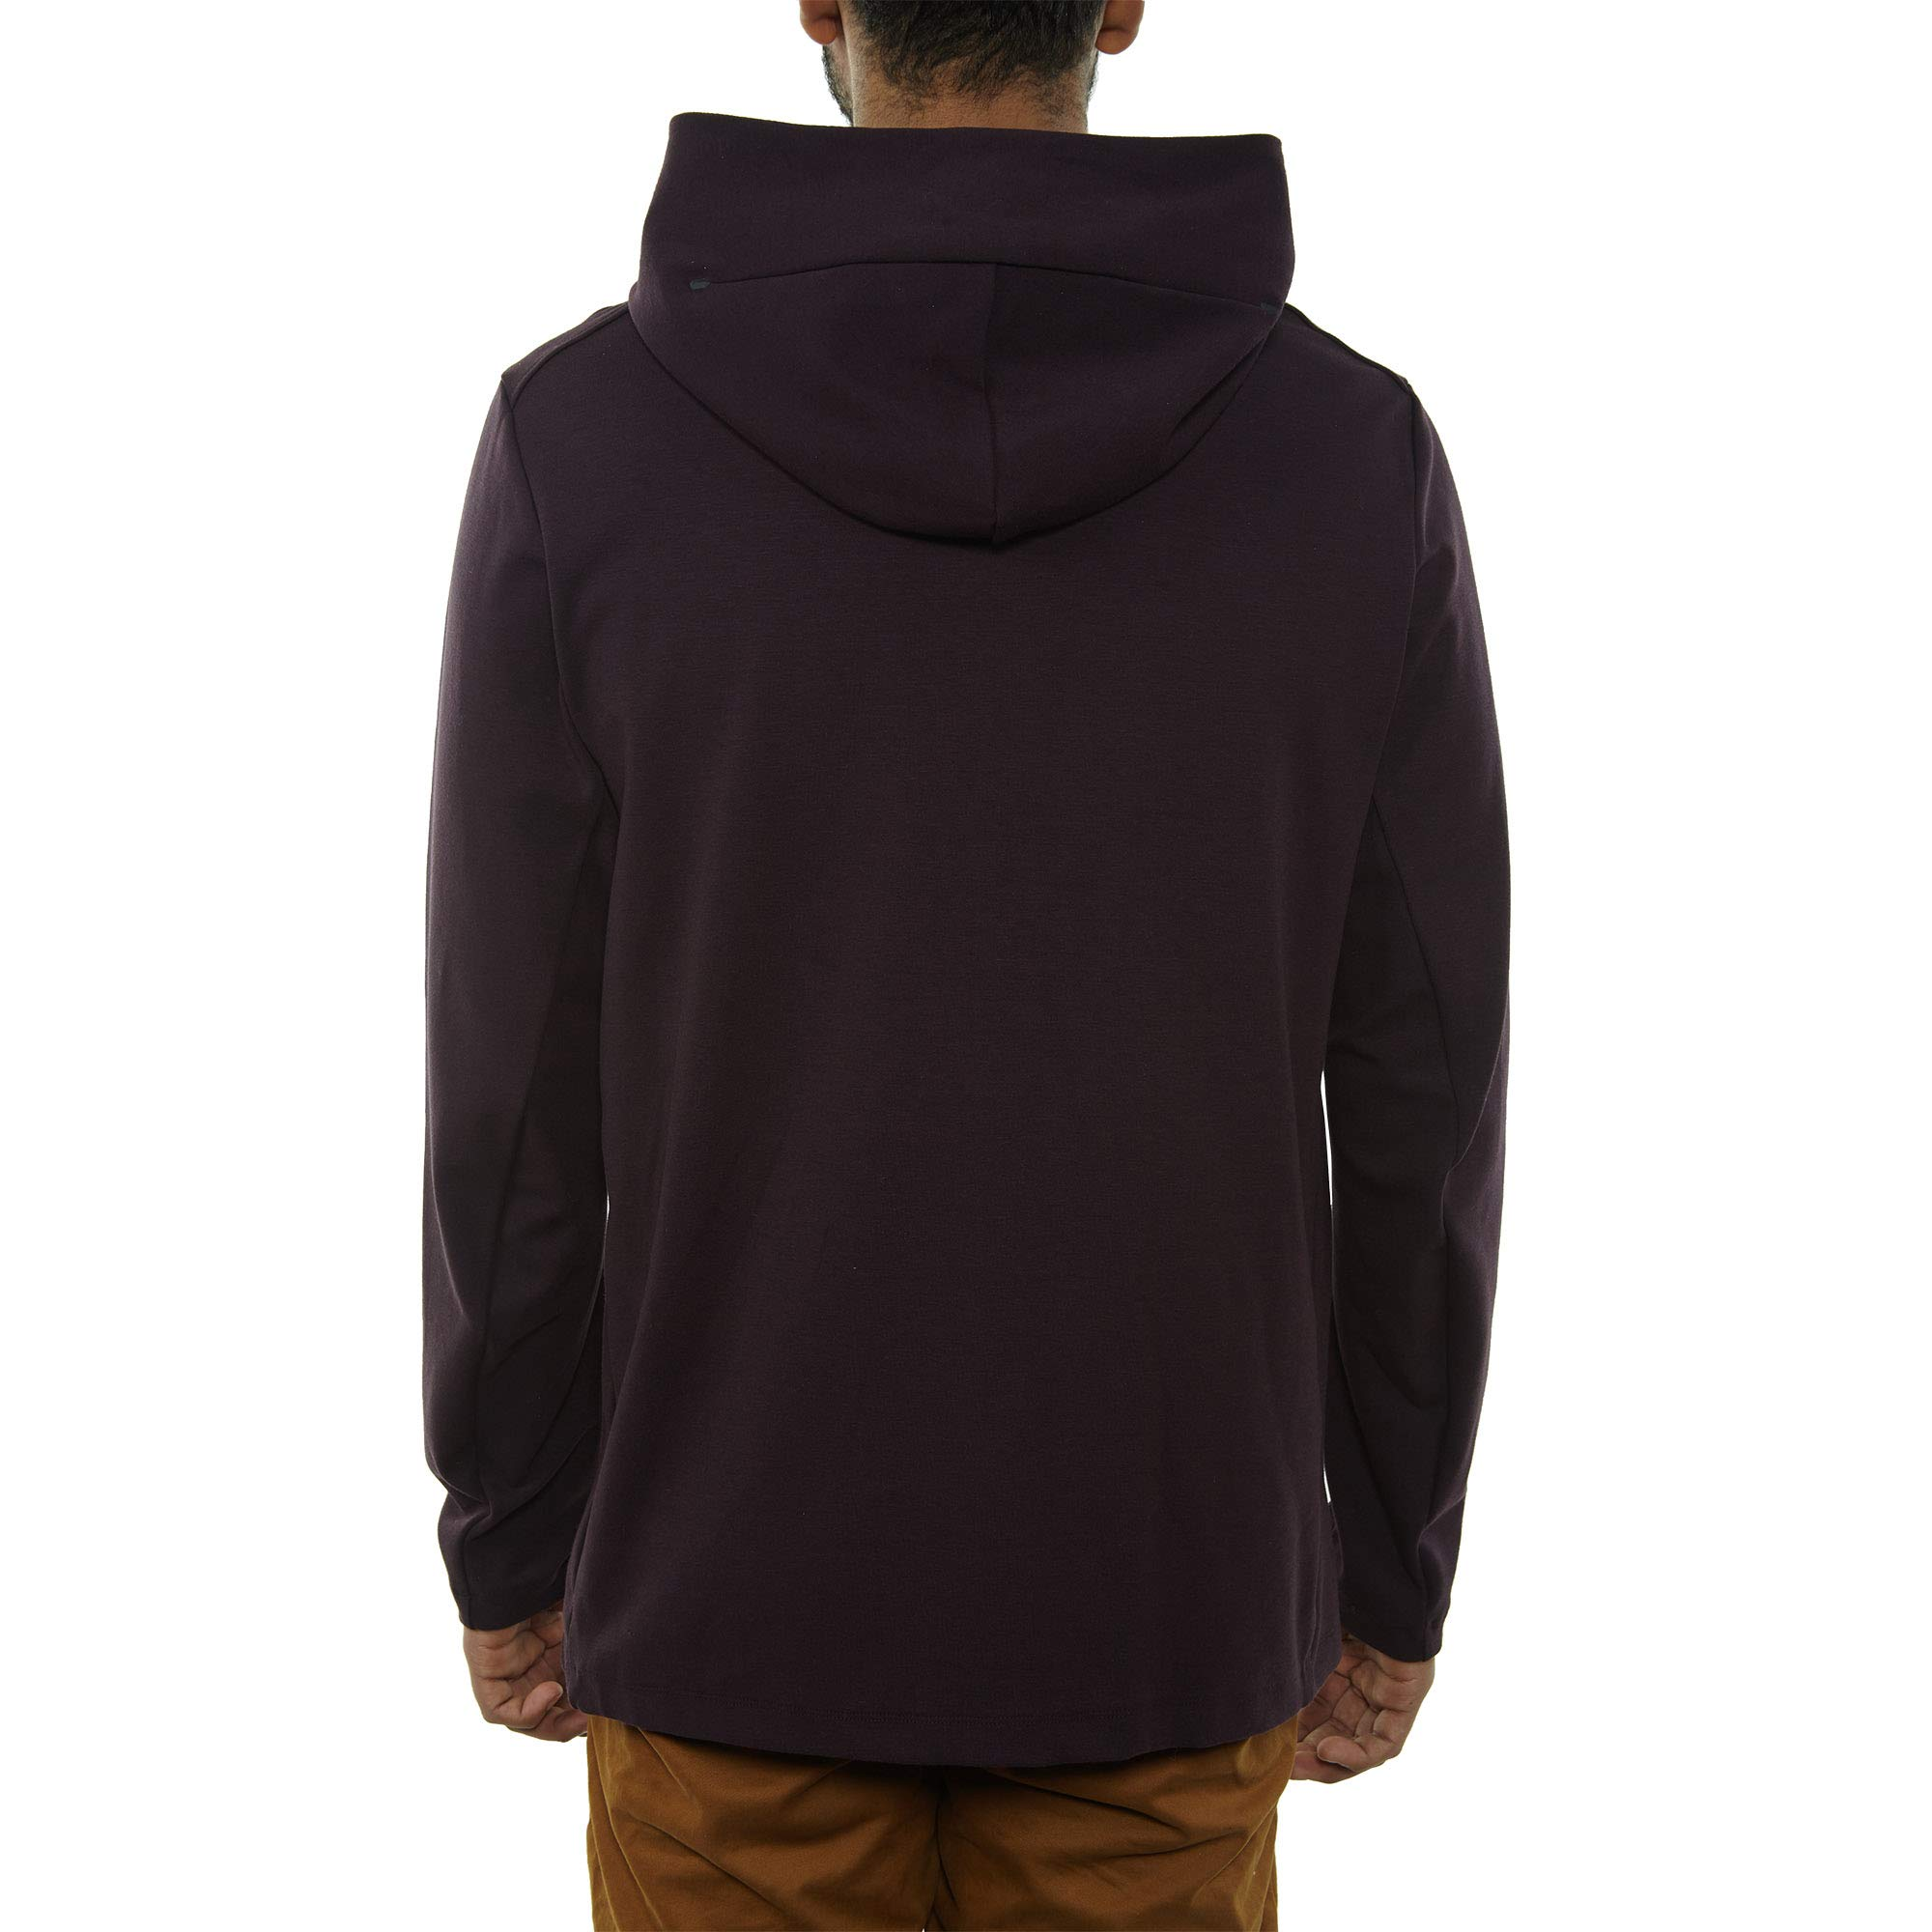 Nike Mens Tech Fleece Pack Full Zip Training Hoodie Burgundy Ash/Black AA3784-659 Size Small by Nike (Image #2)